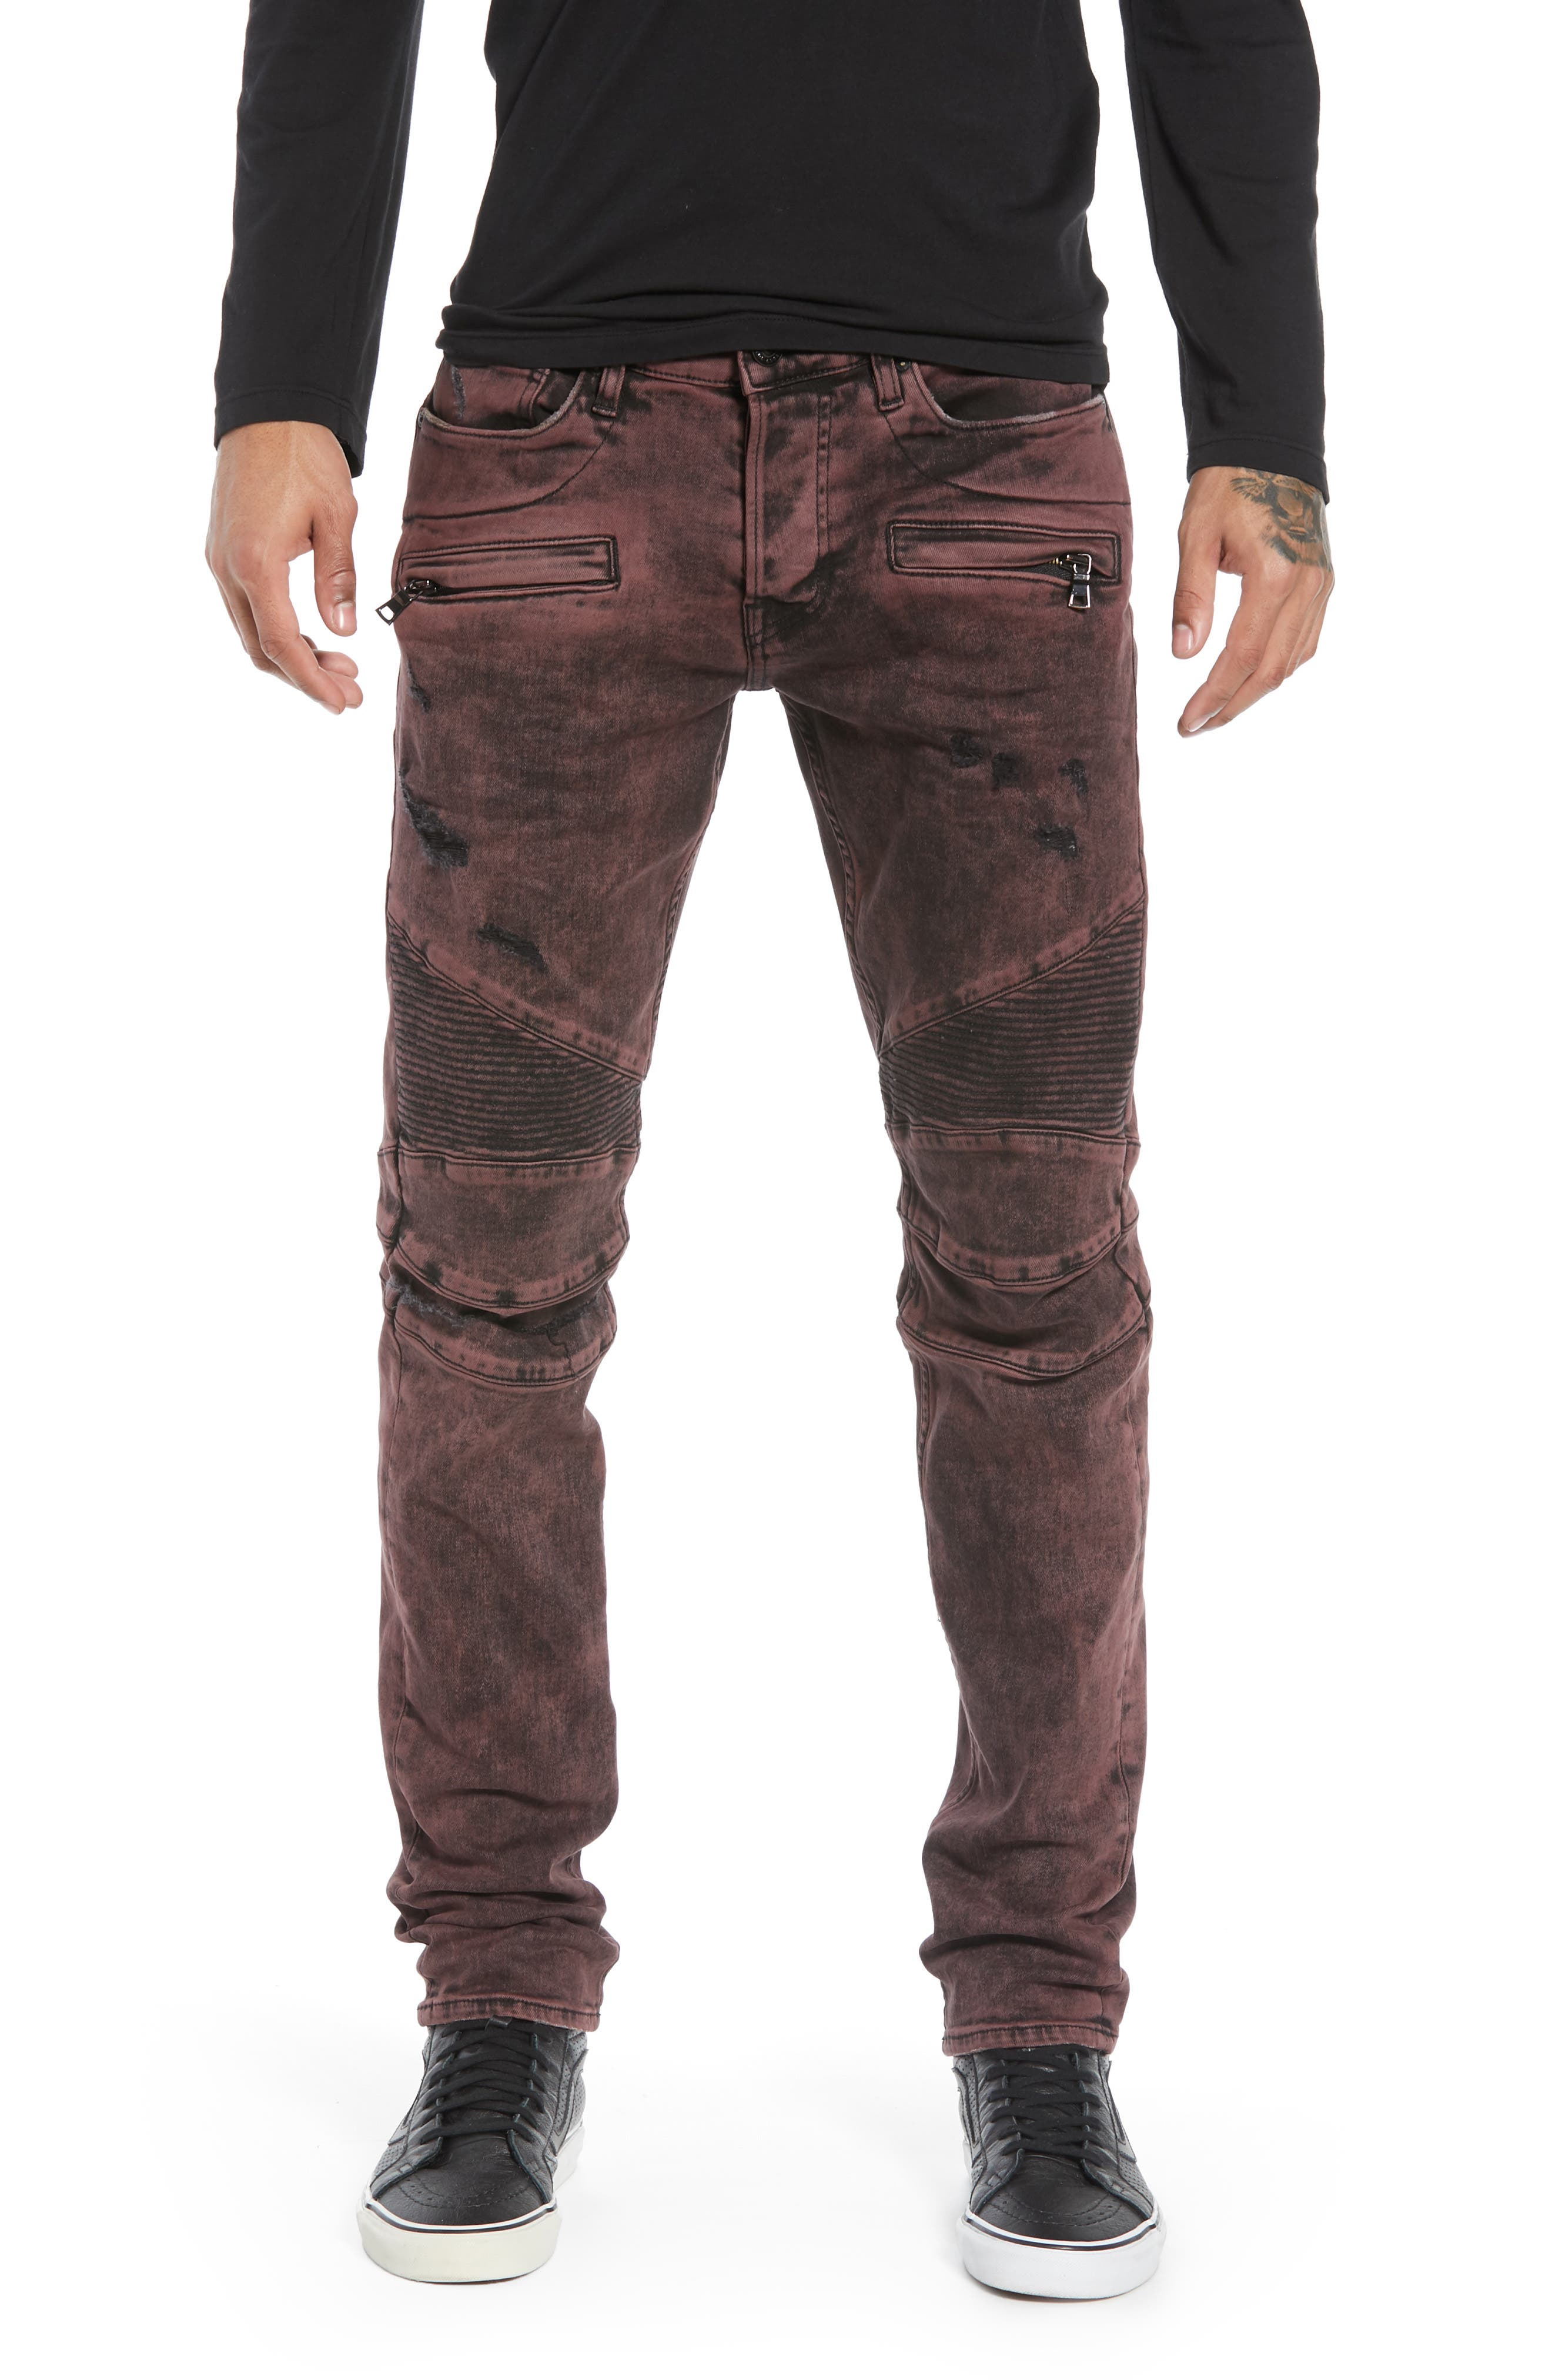 HUDSON JEANS, Blinder Biker Skinny Fit Jeans, Main thumbnail 1, color, FADED OX BLOOD